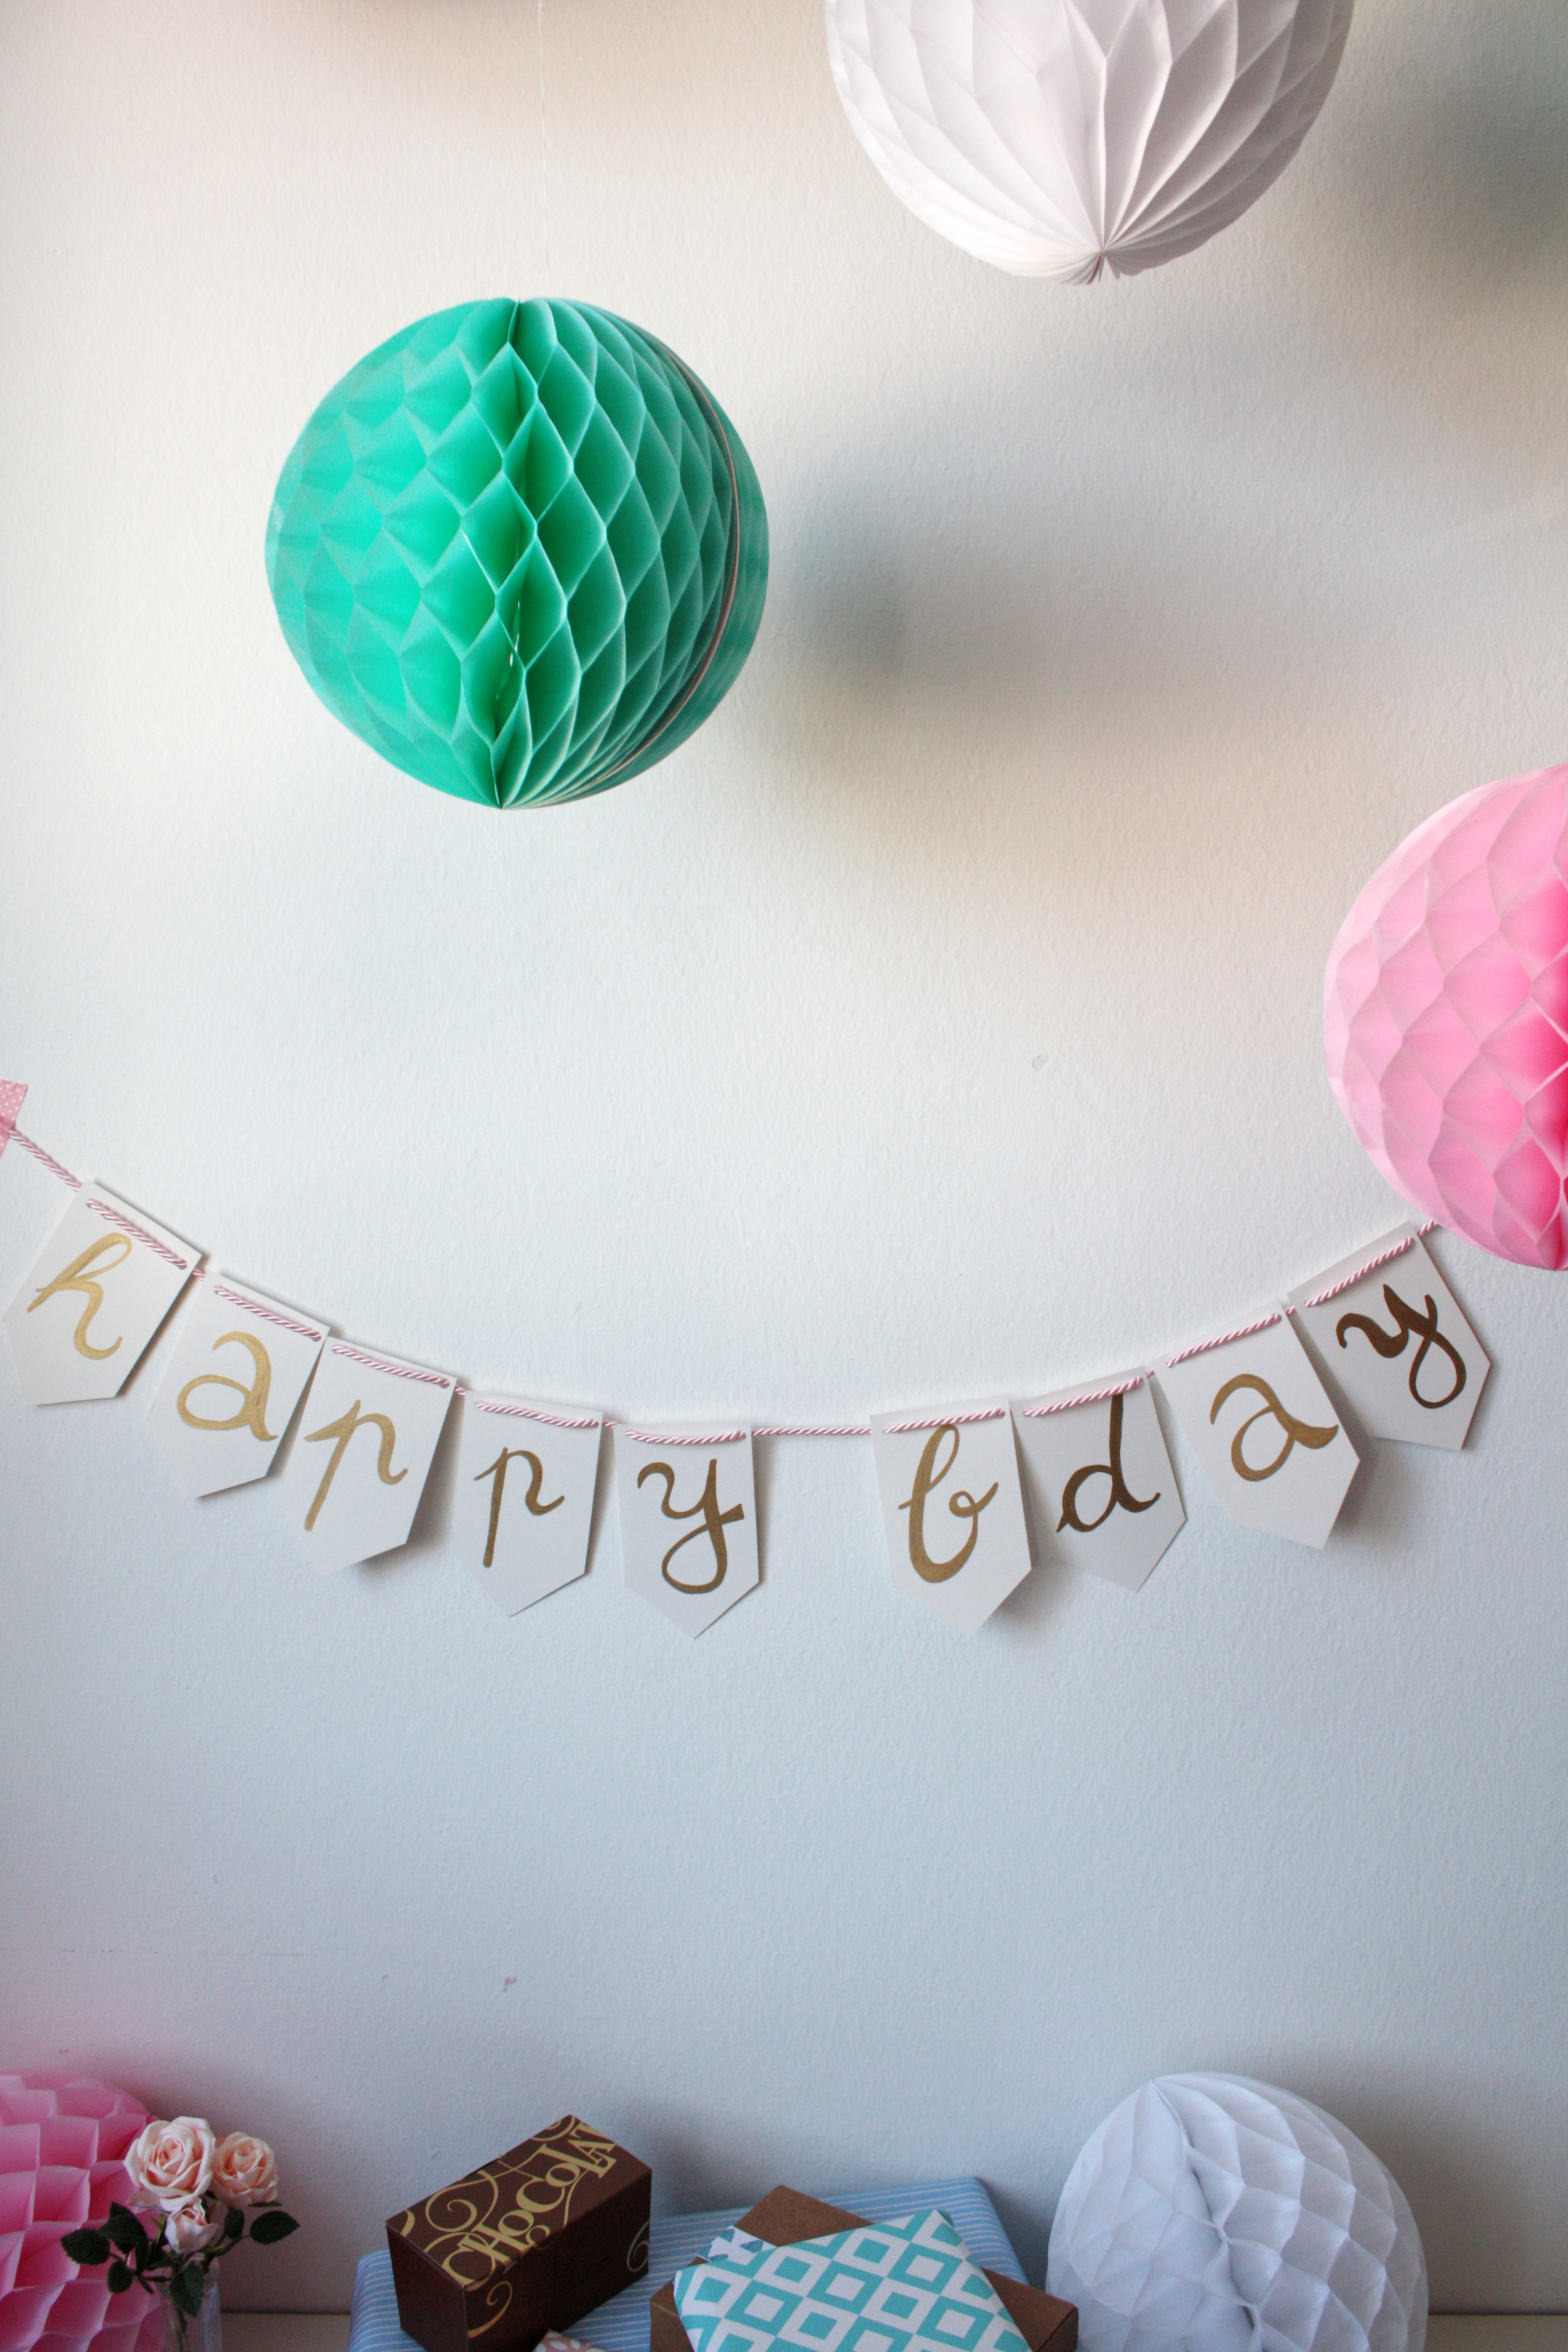 happy birthday wimpelkette diy 4 rosy grey diy blog lettering m nchen. Black Bedroom Furniture Sets. Home Design Ideas